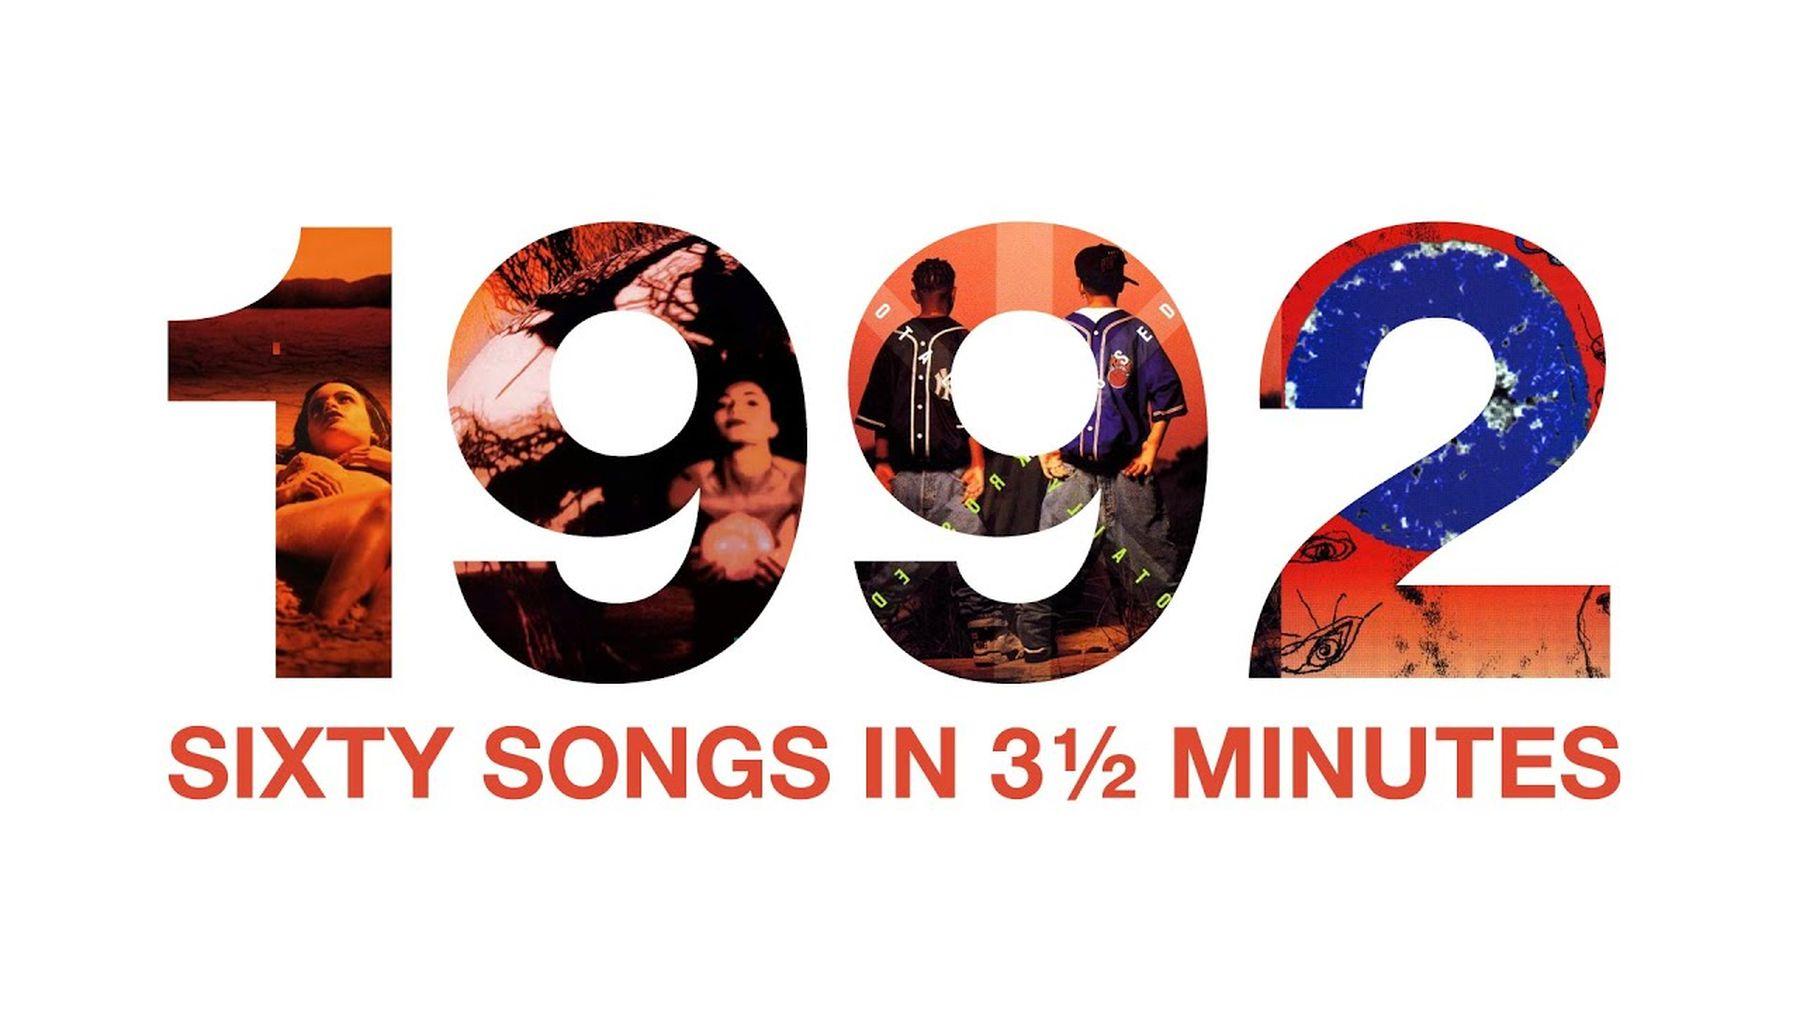 DIE Songs aus dem Jahr 1992 | Musik | Was is hier eigentlich los?